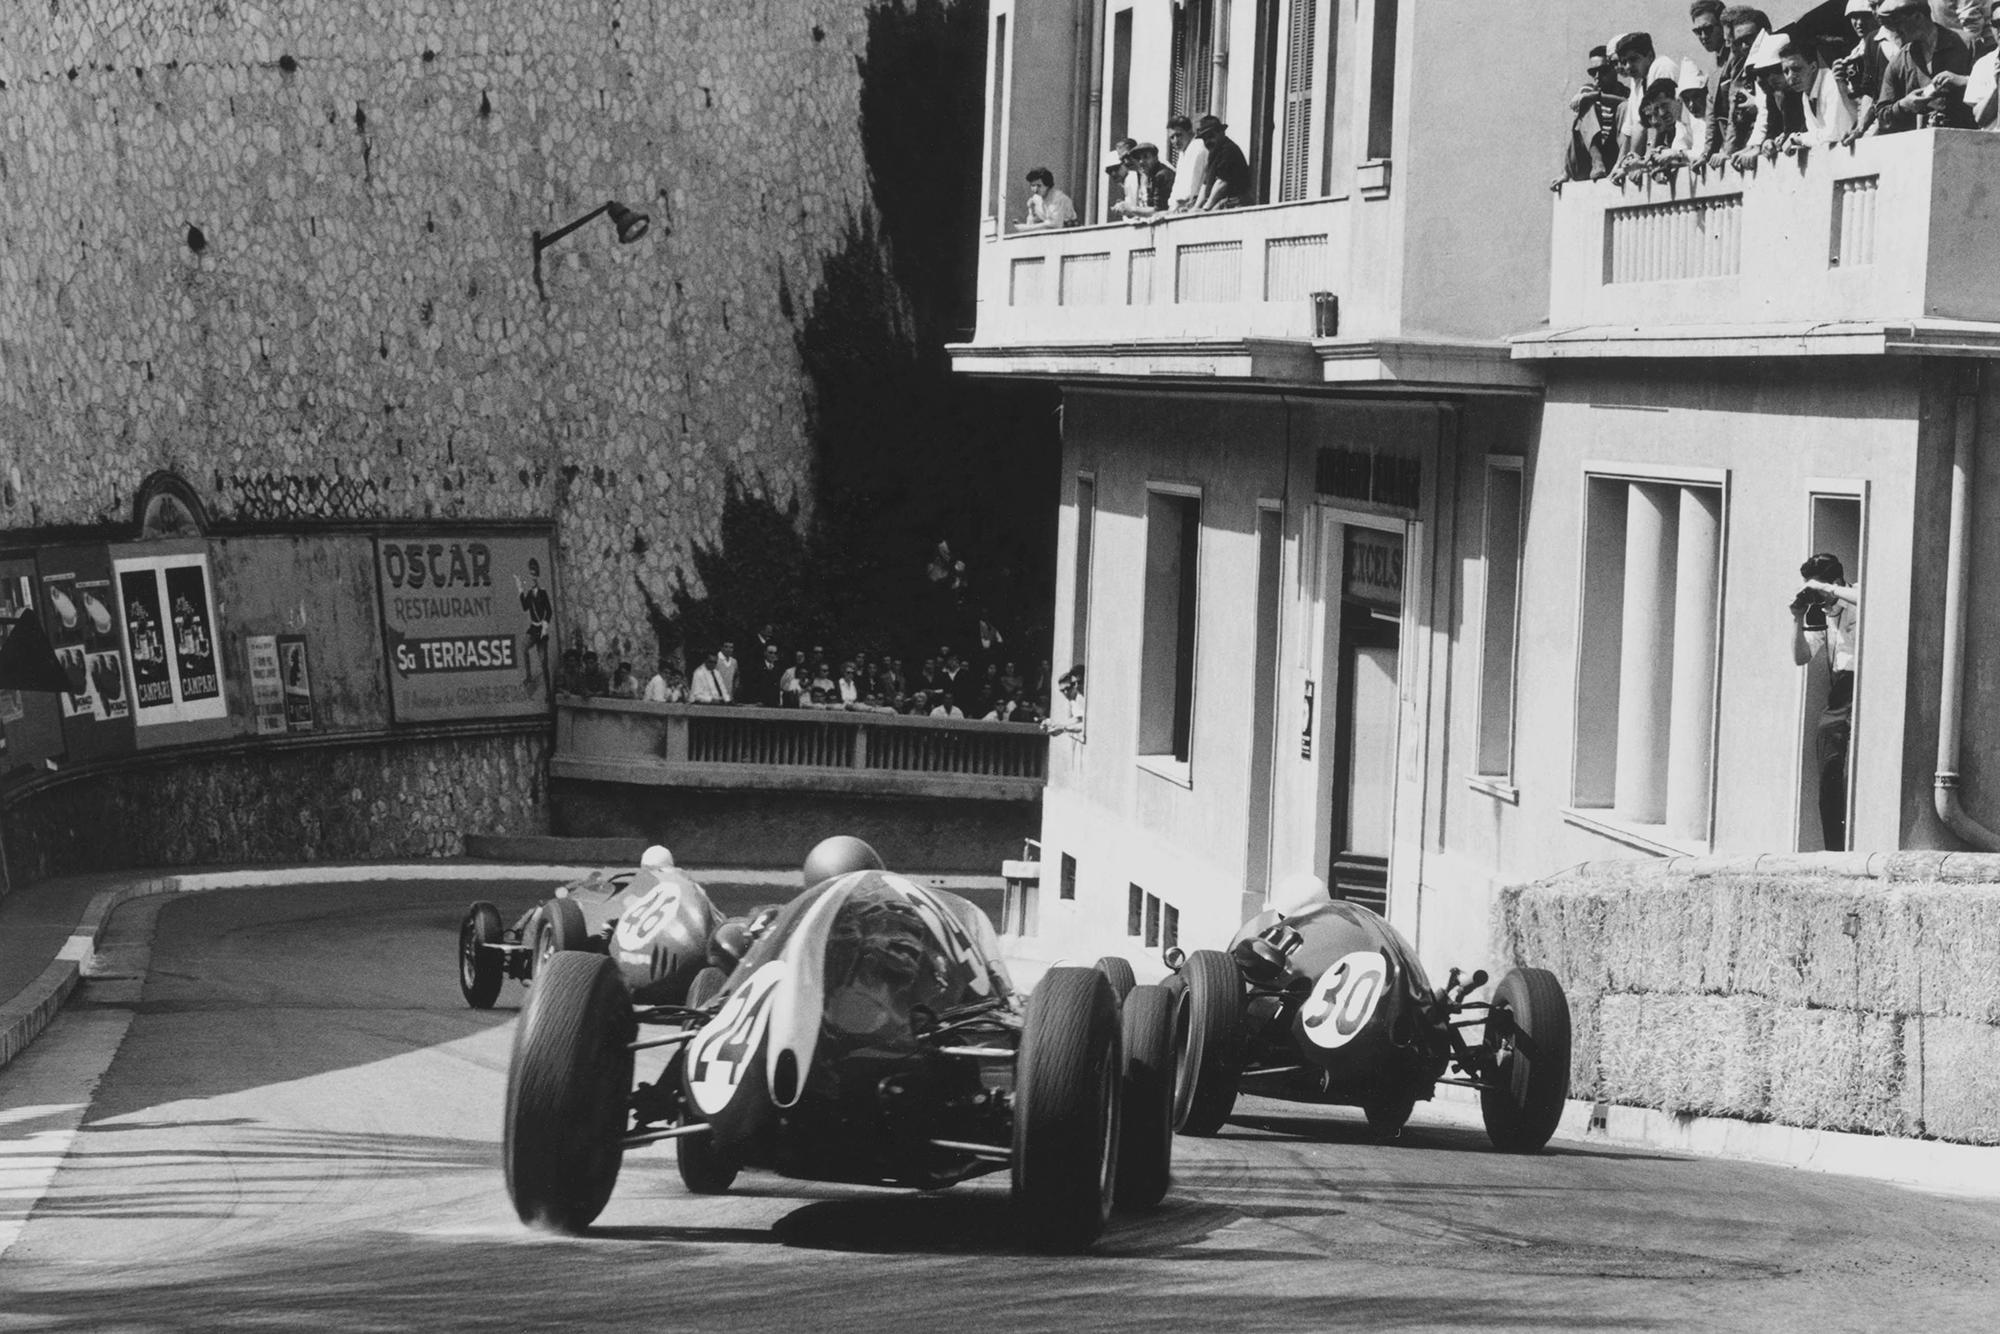 Jean Behra in a Ferrari Dino 246 leads Stirling Moss in his Cooper T51-Climax